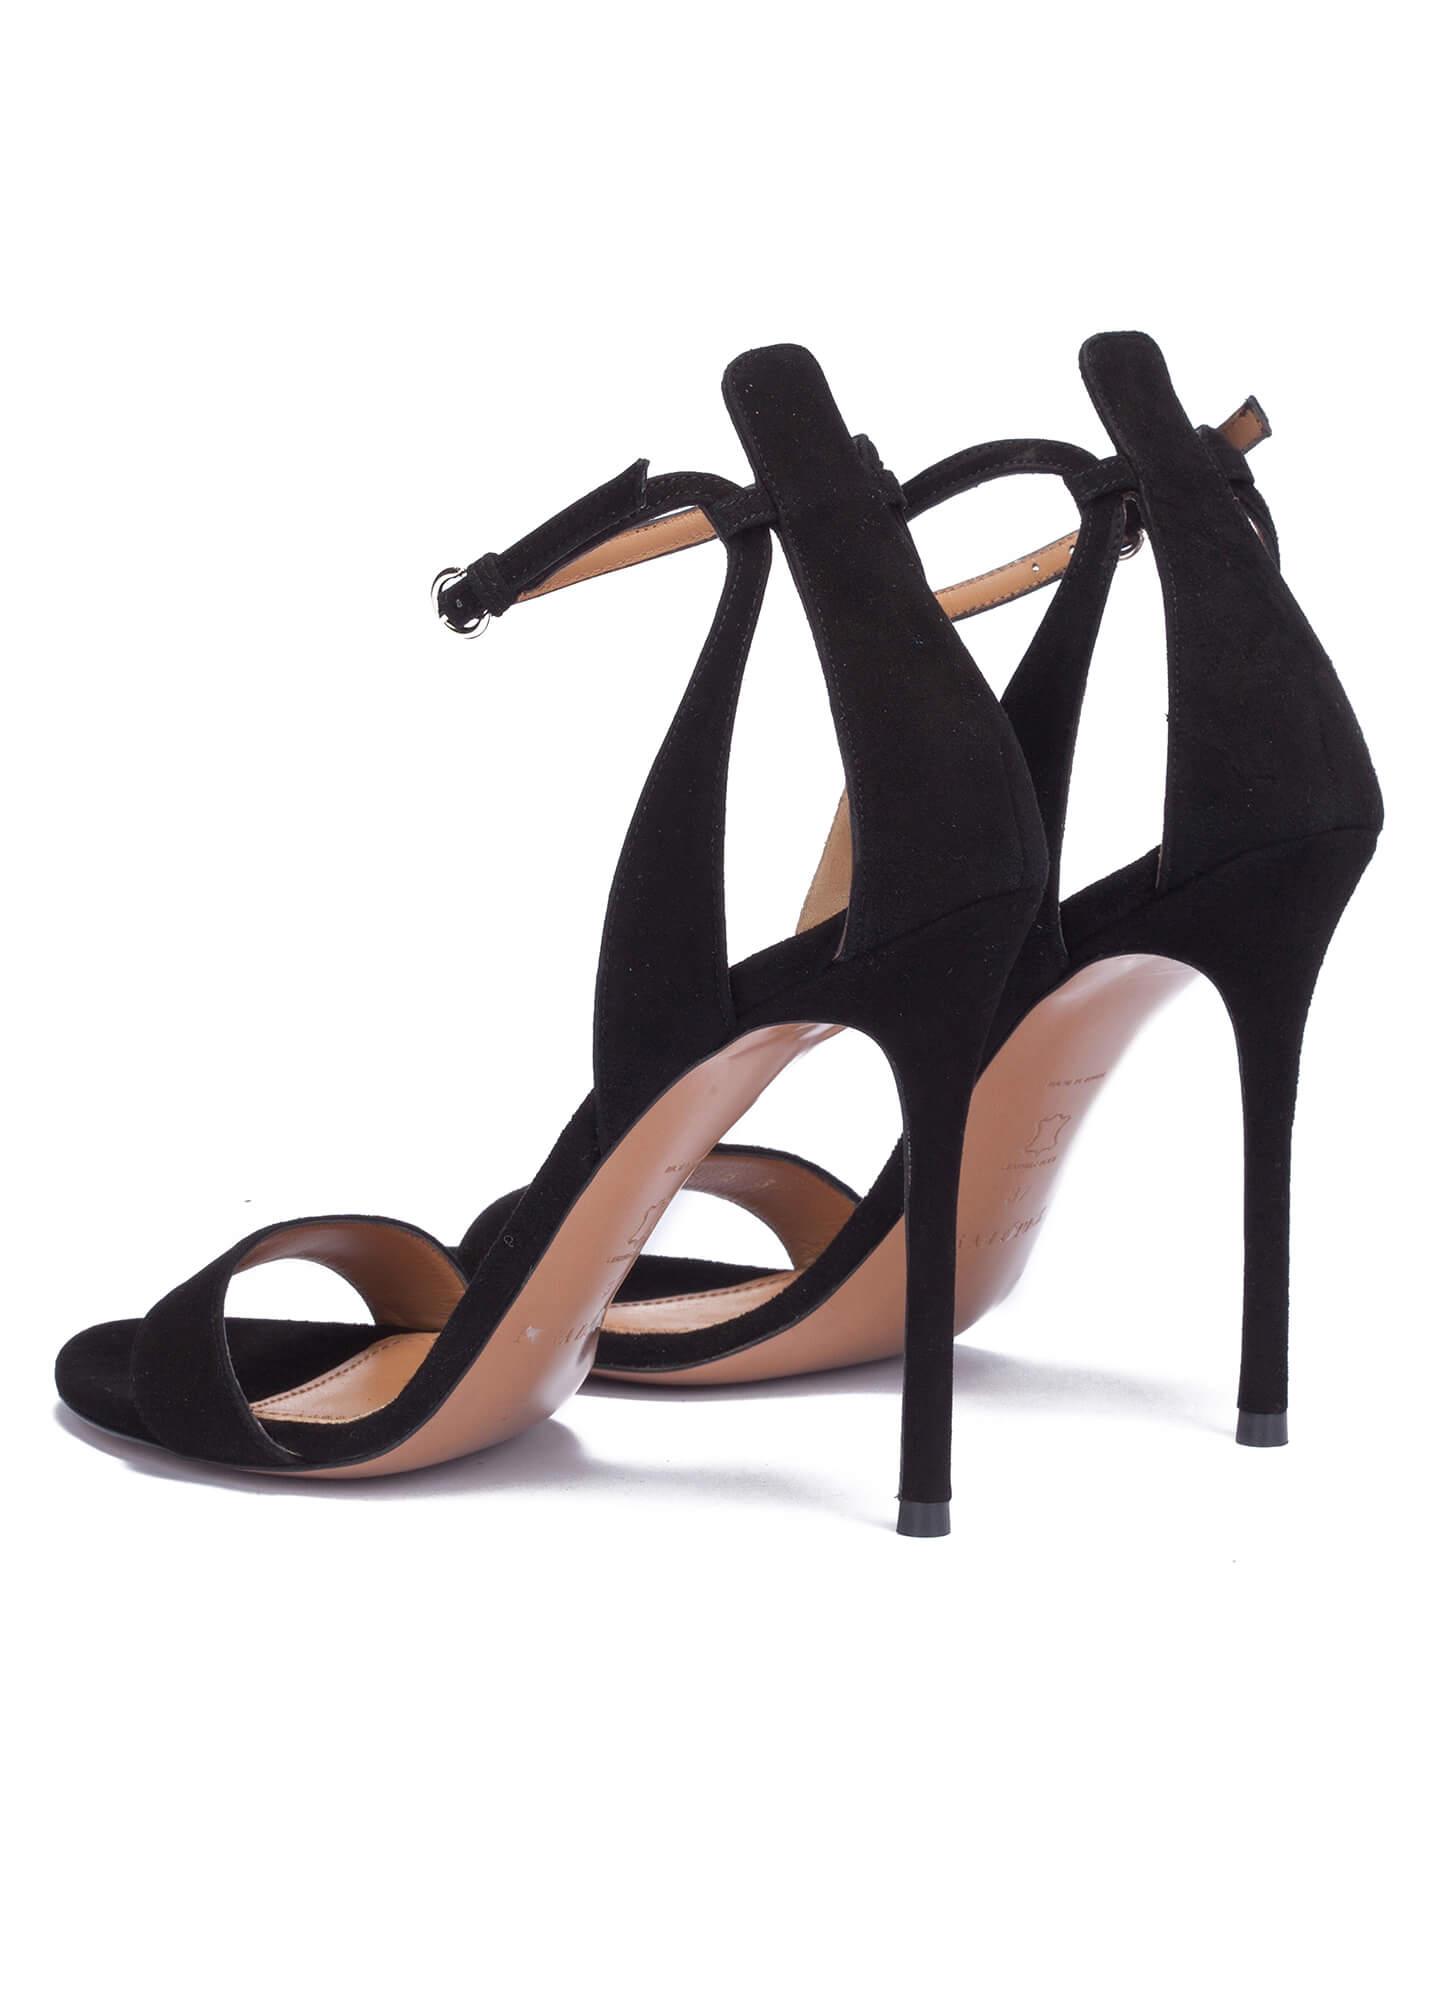 4c4e7f85d175 High heel sandals in black suede - online shoe store Pura Lopez ...